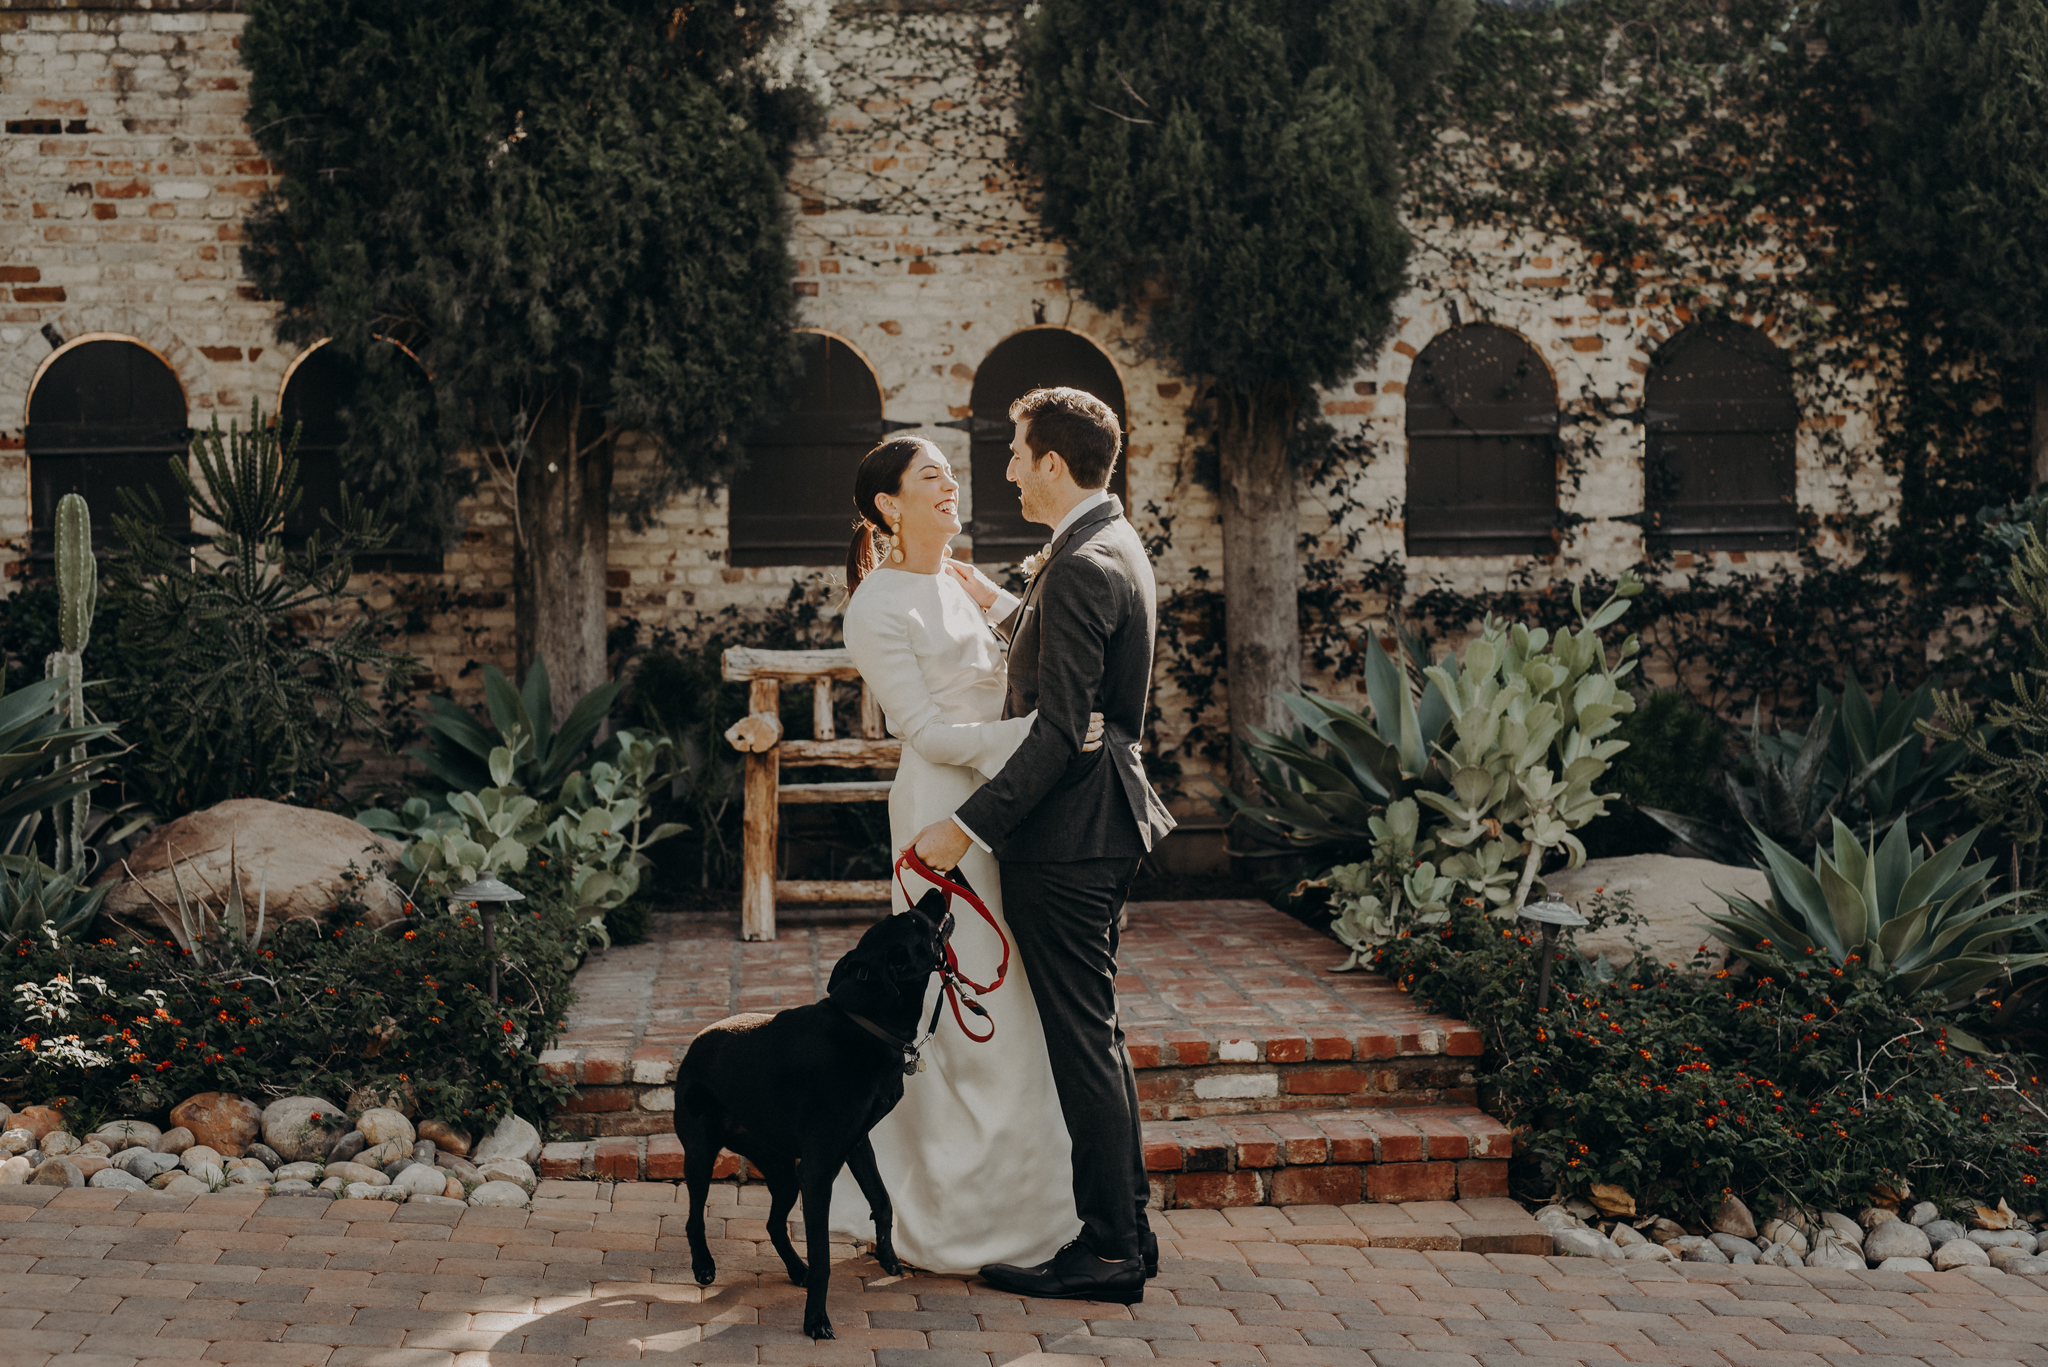 Hummingbird Nest Ranch Wedding - Wedding Photographer in Los Angeles - IsaiahAndTaylor.com-023.jpg